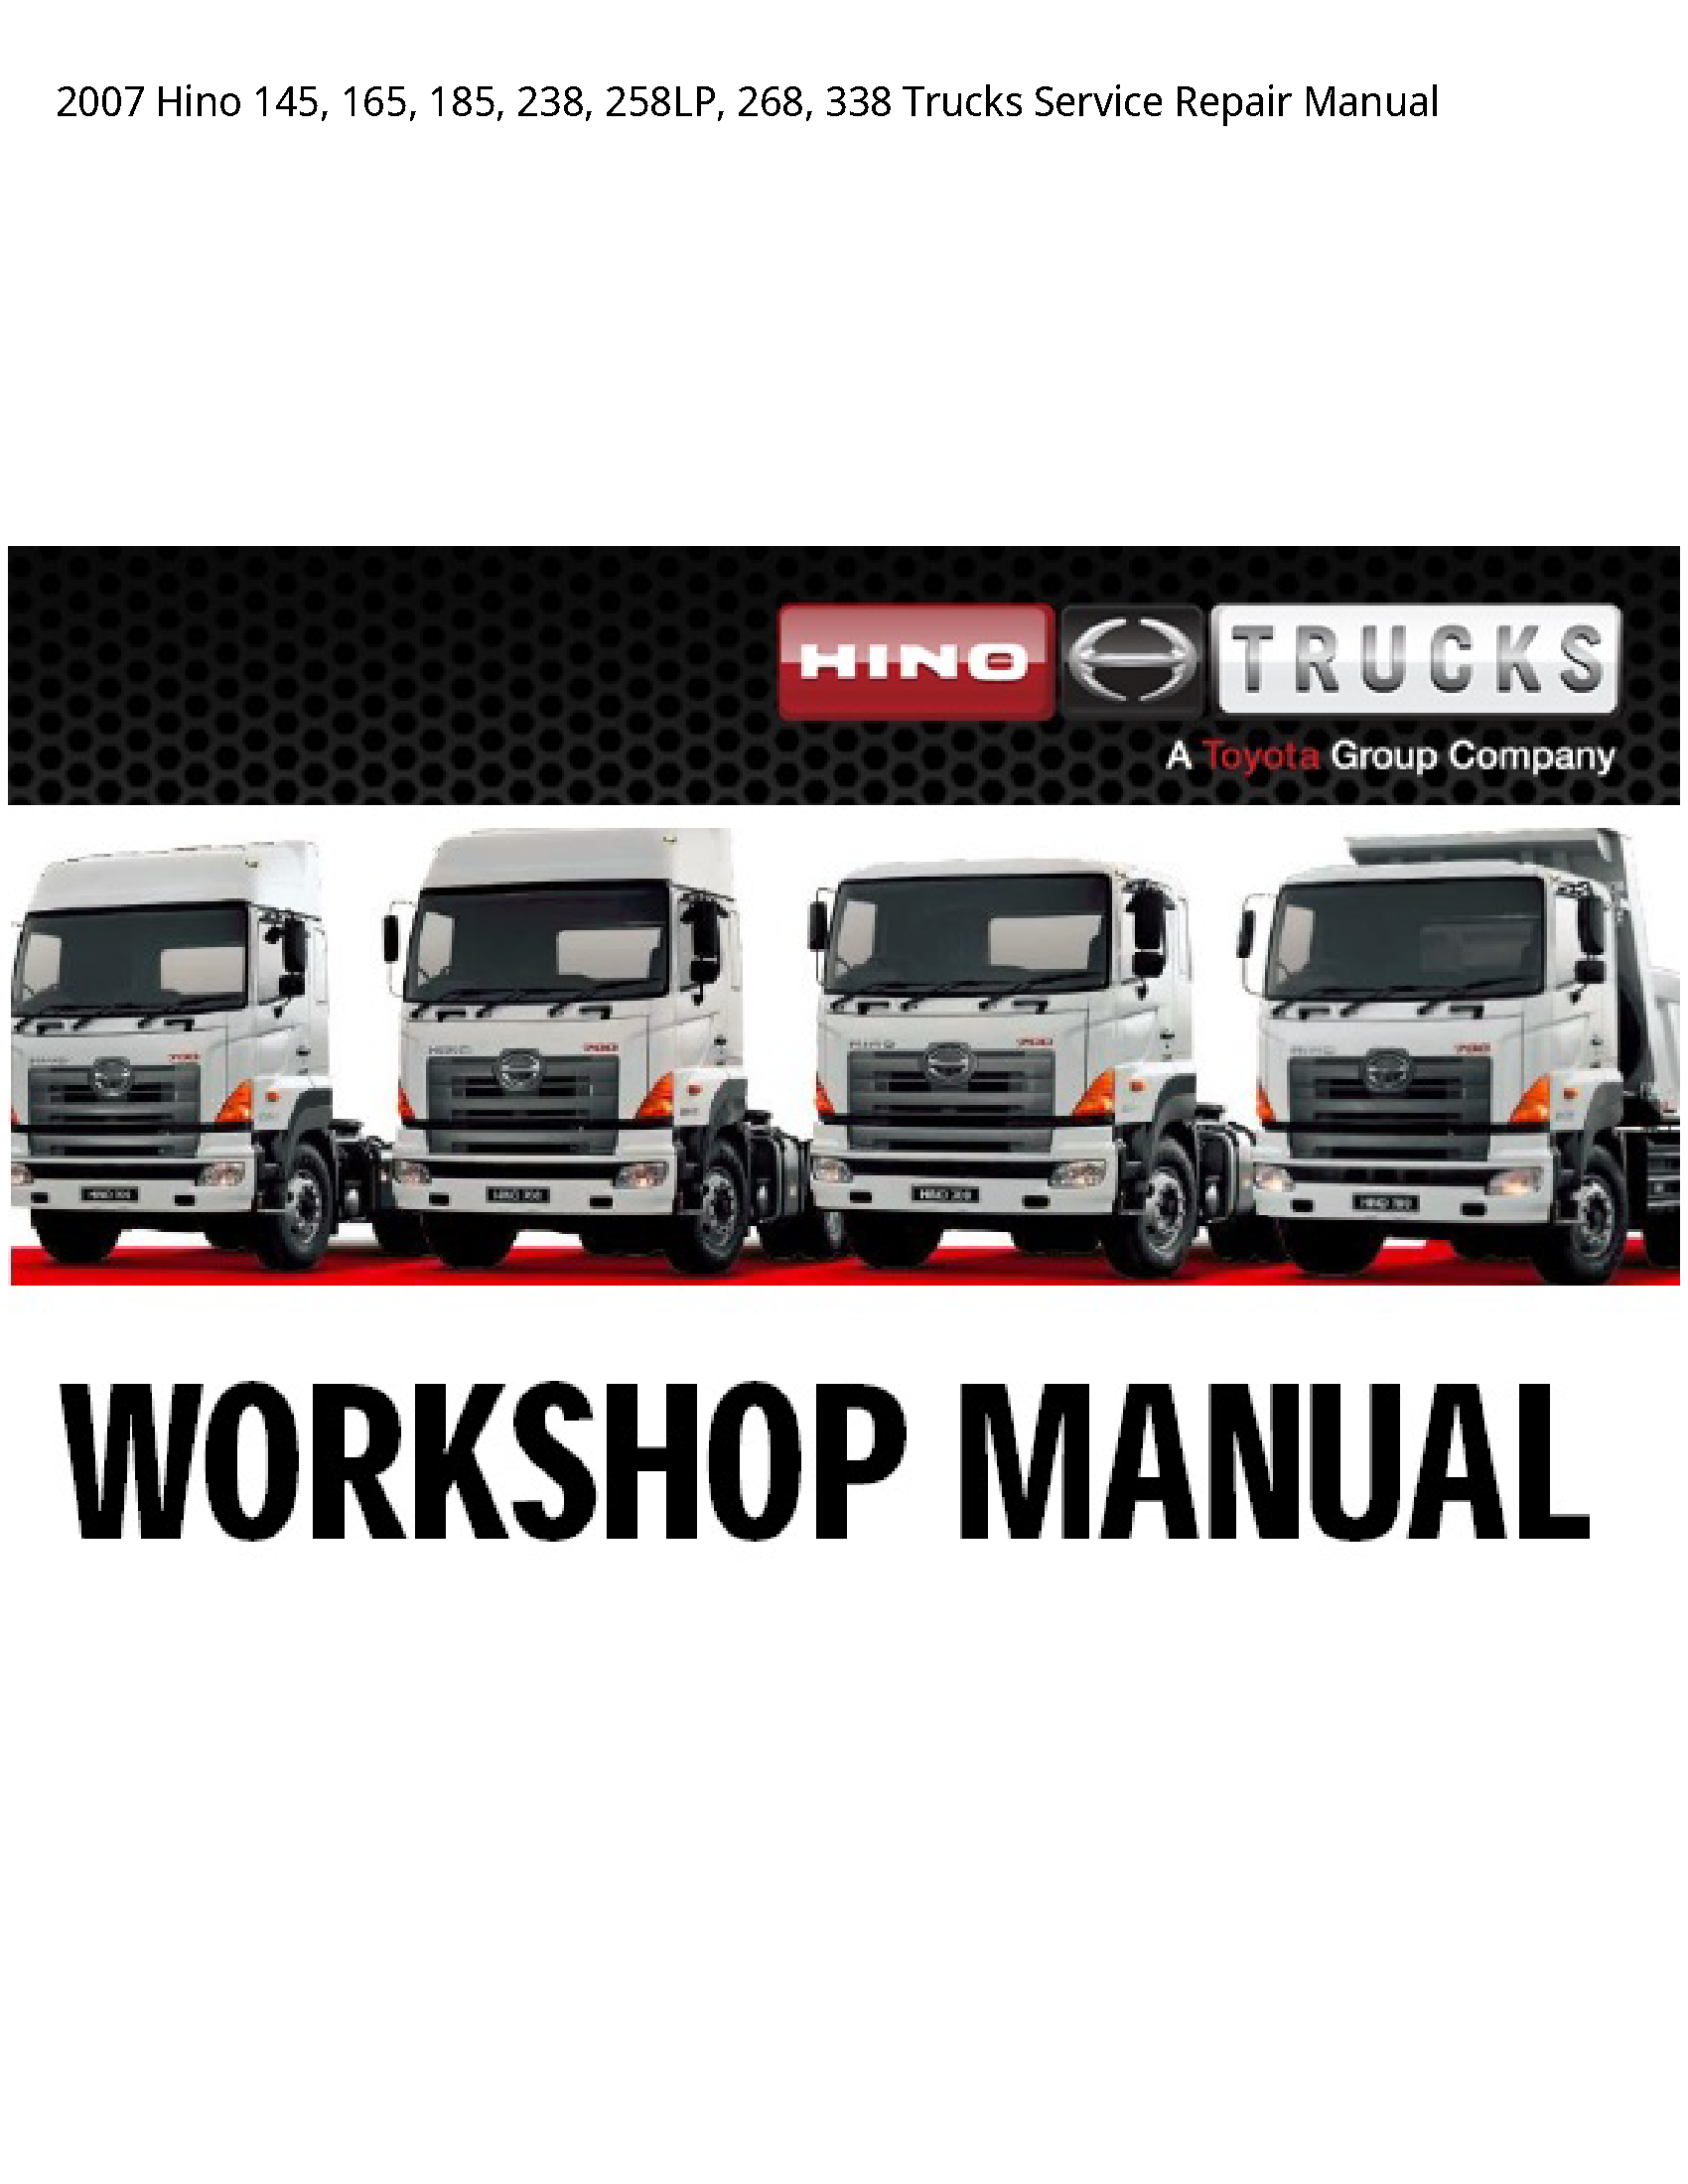 Hino 145 Trucks manual